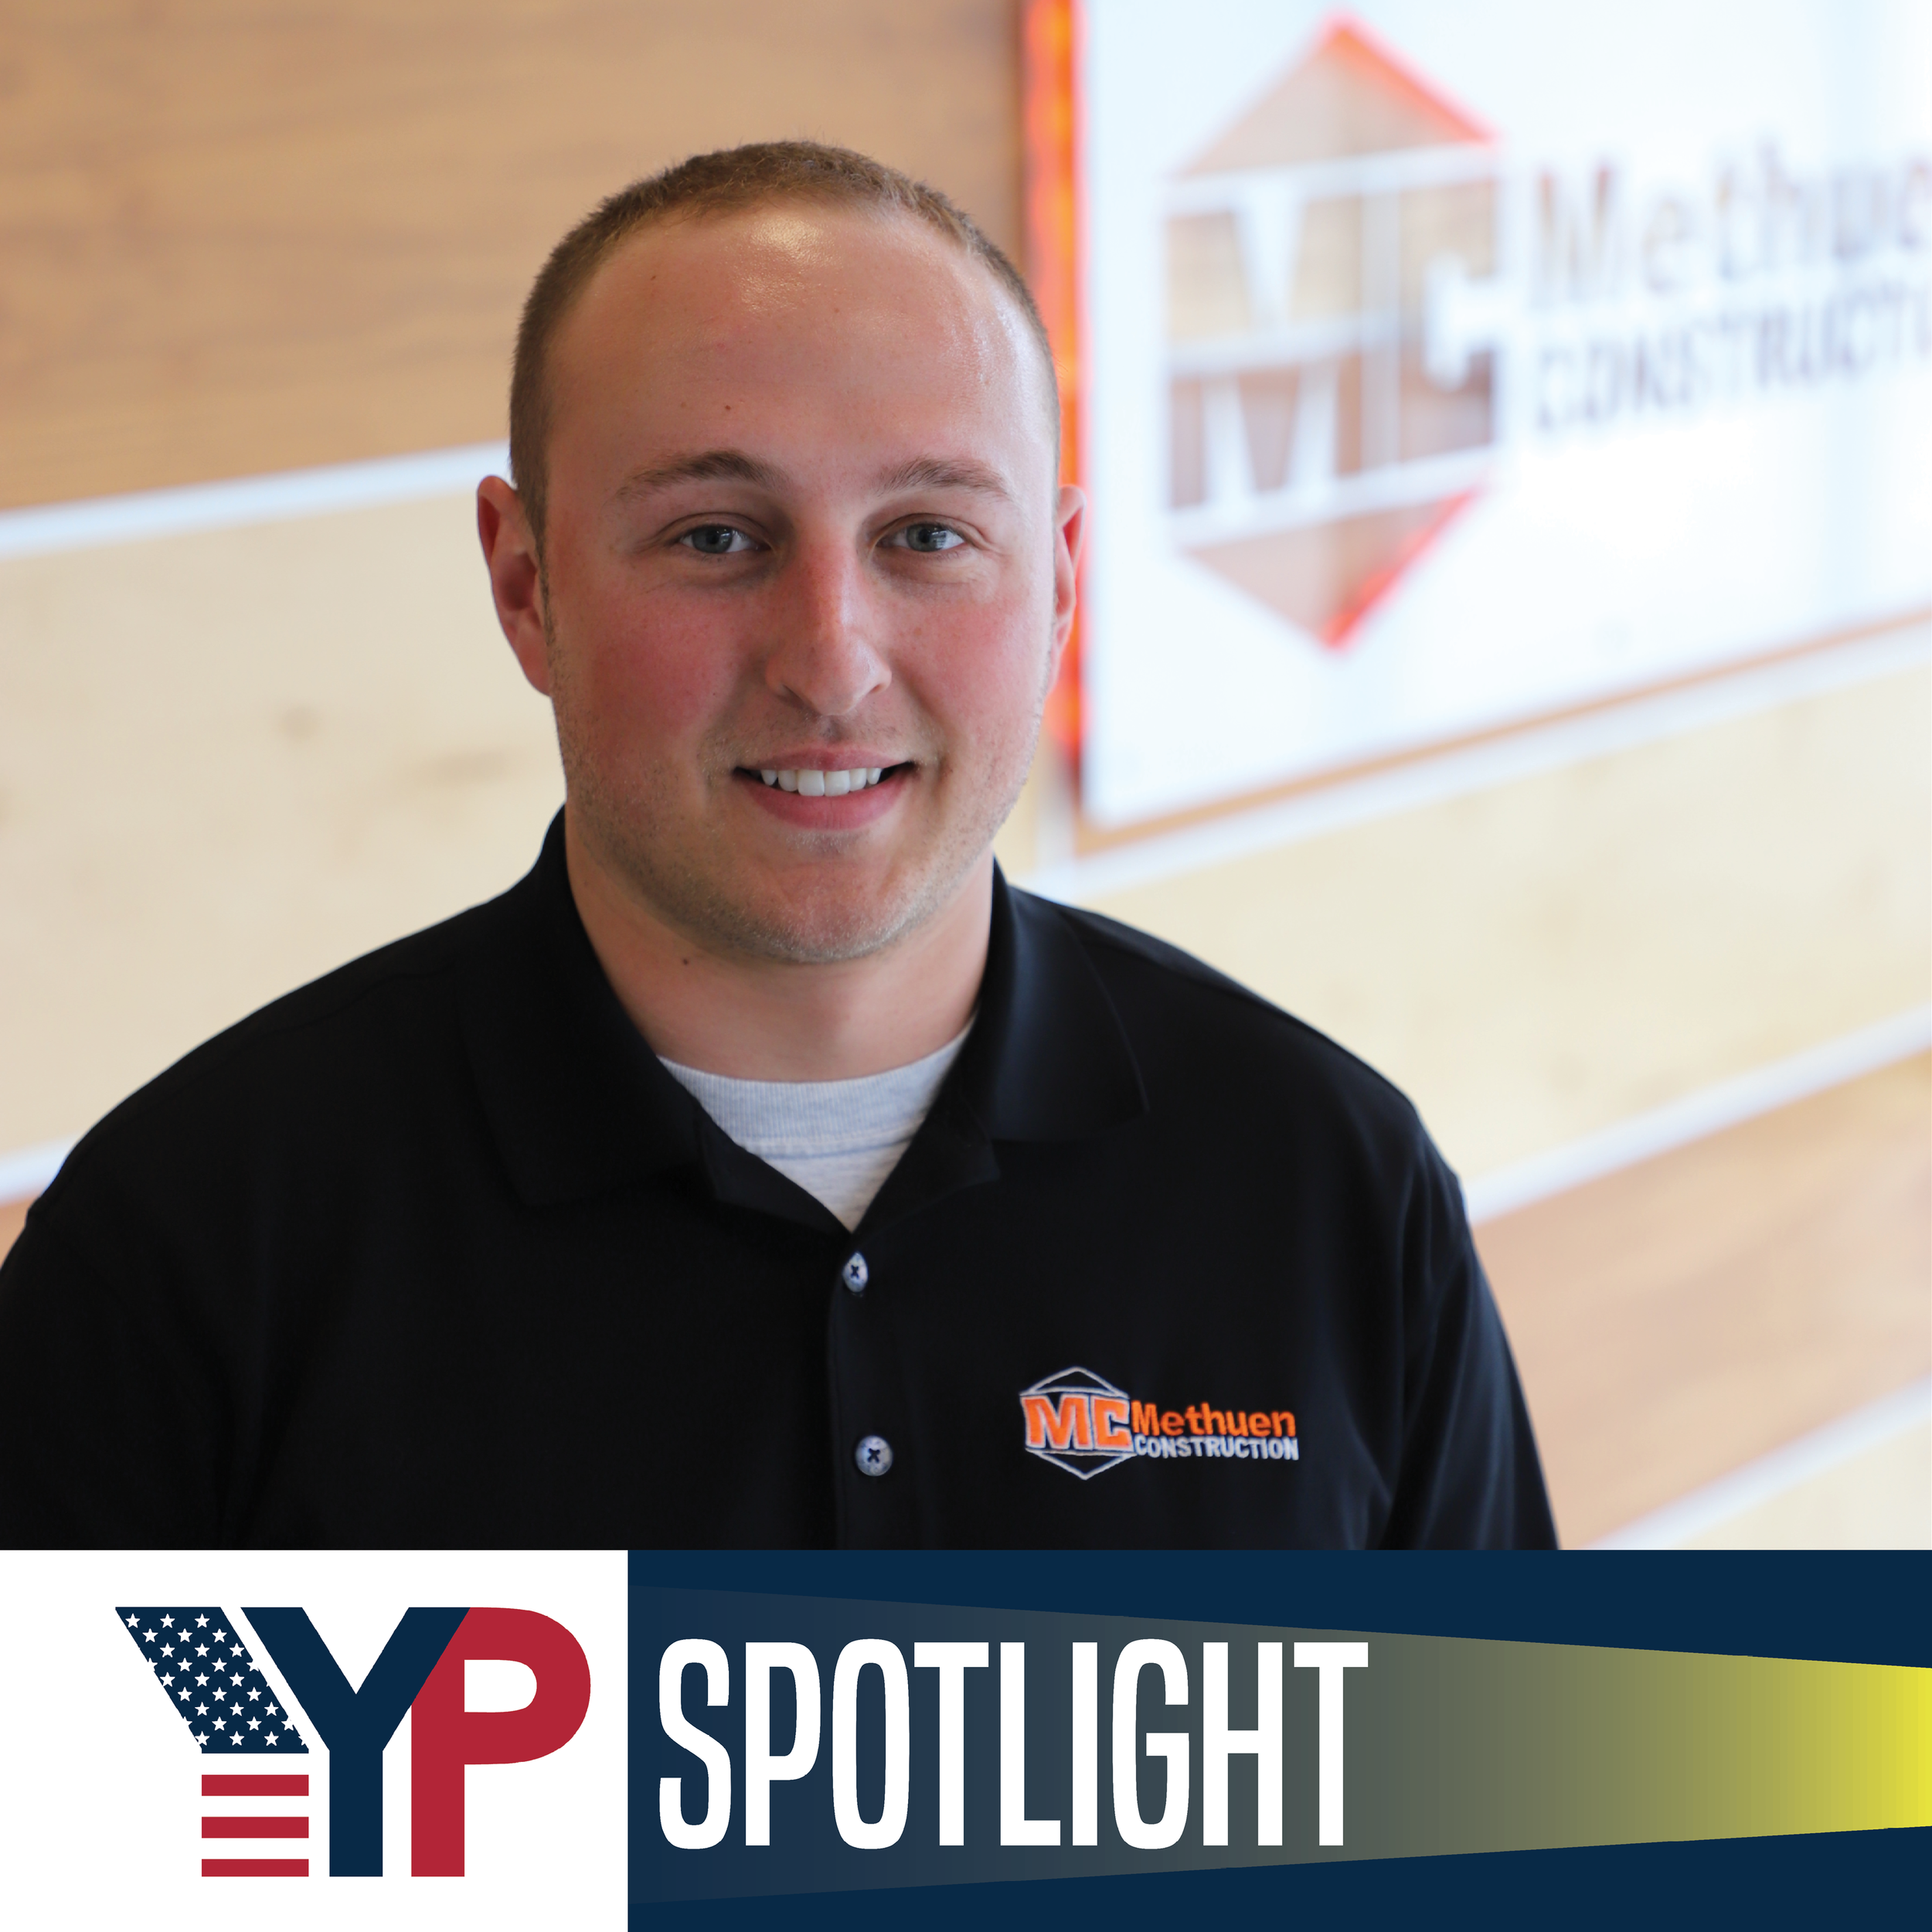 YP Spotlight - 2019-04 Cody Barnes - FACEBOOK.png